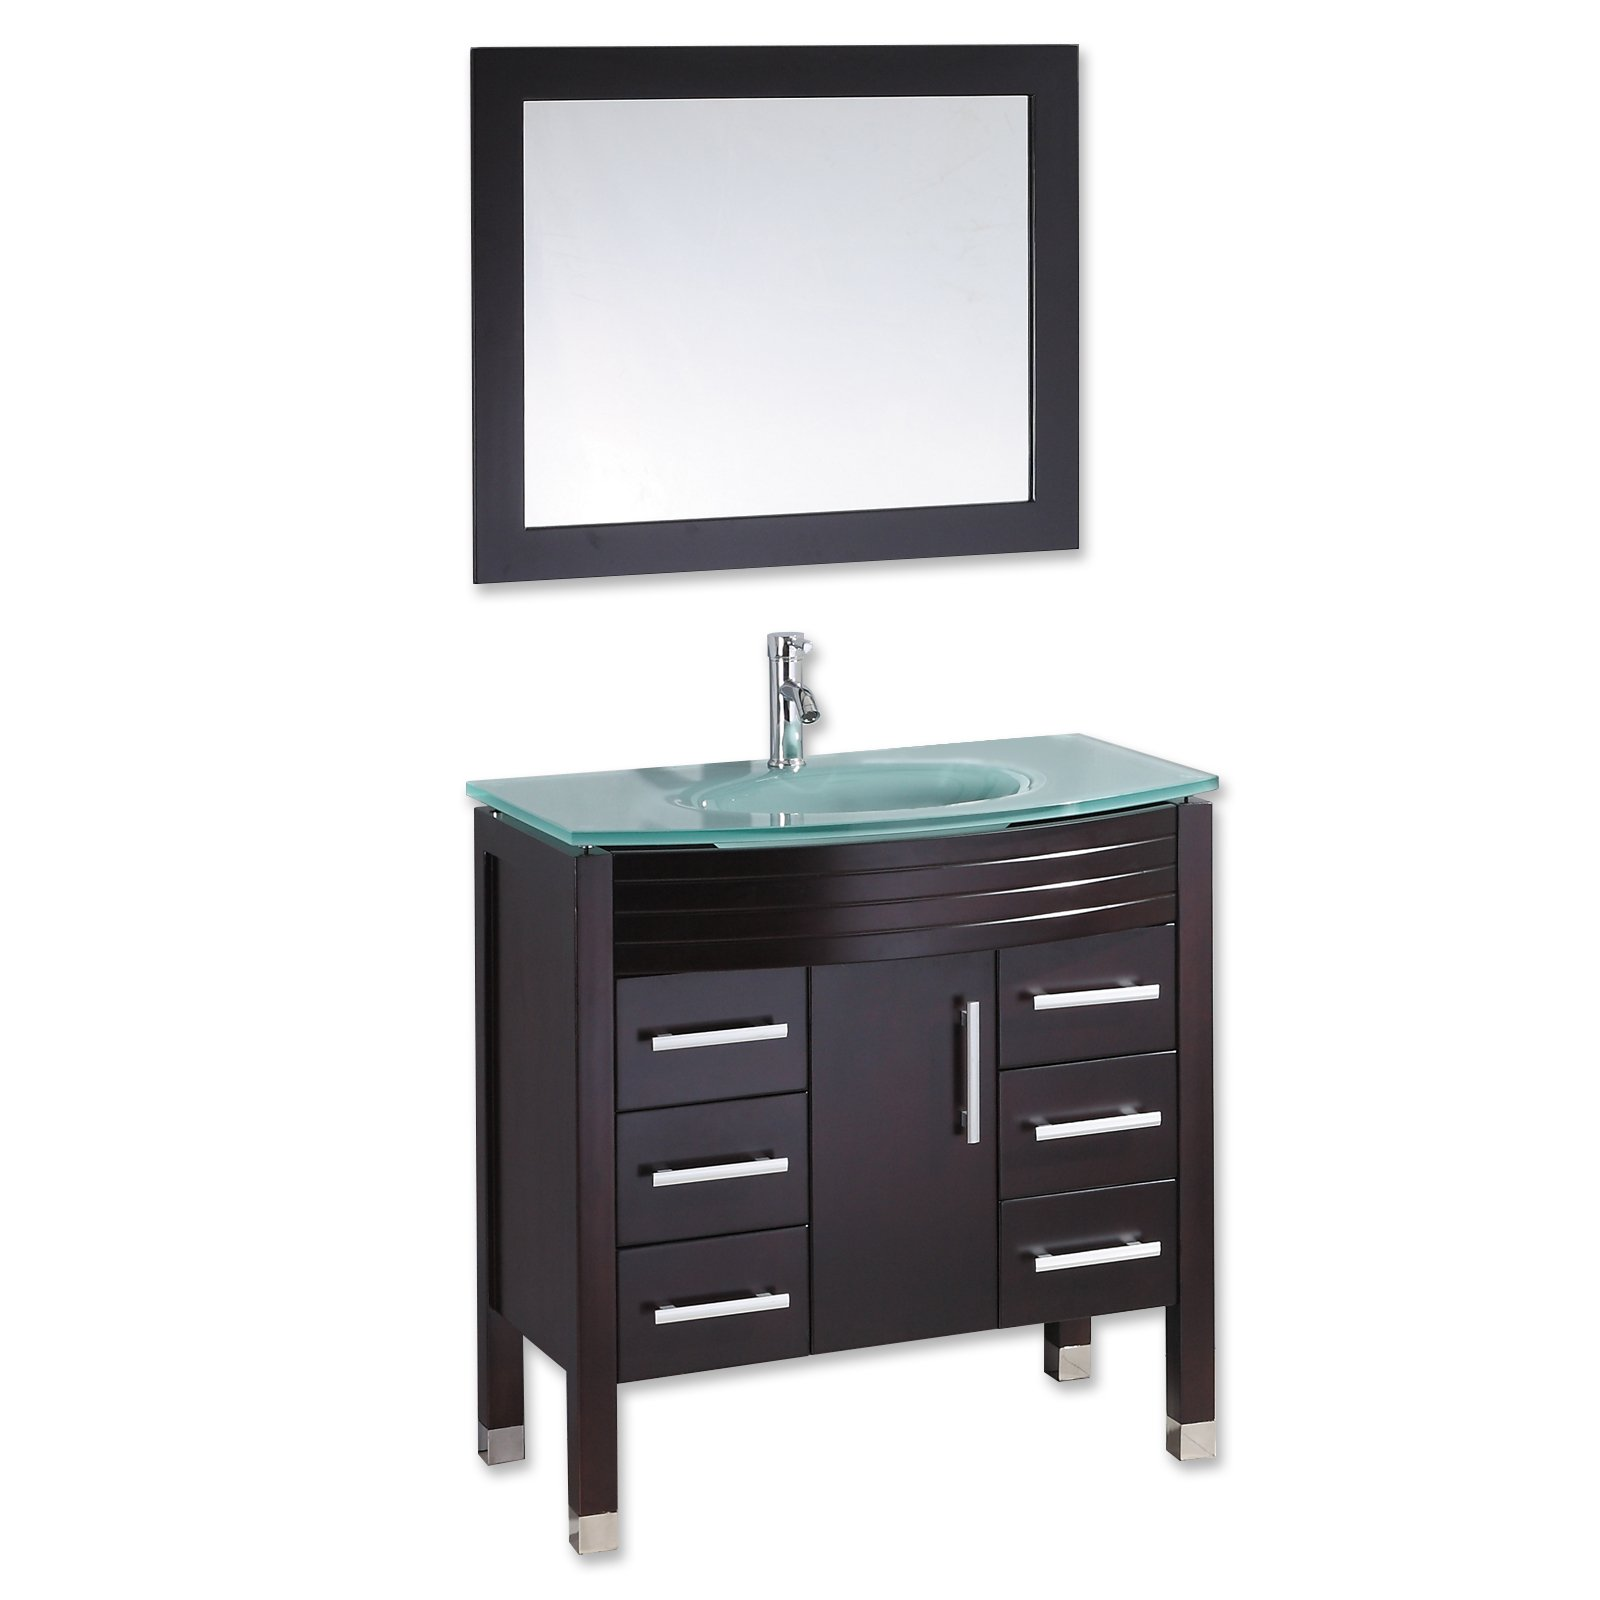 36 Inch Espresso Wood & Glass Single Basin Sink Bathroom Vanity Set-''Cyrus'' by The Tub Connection